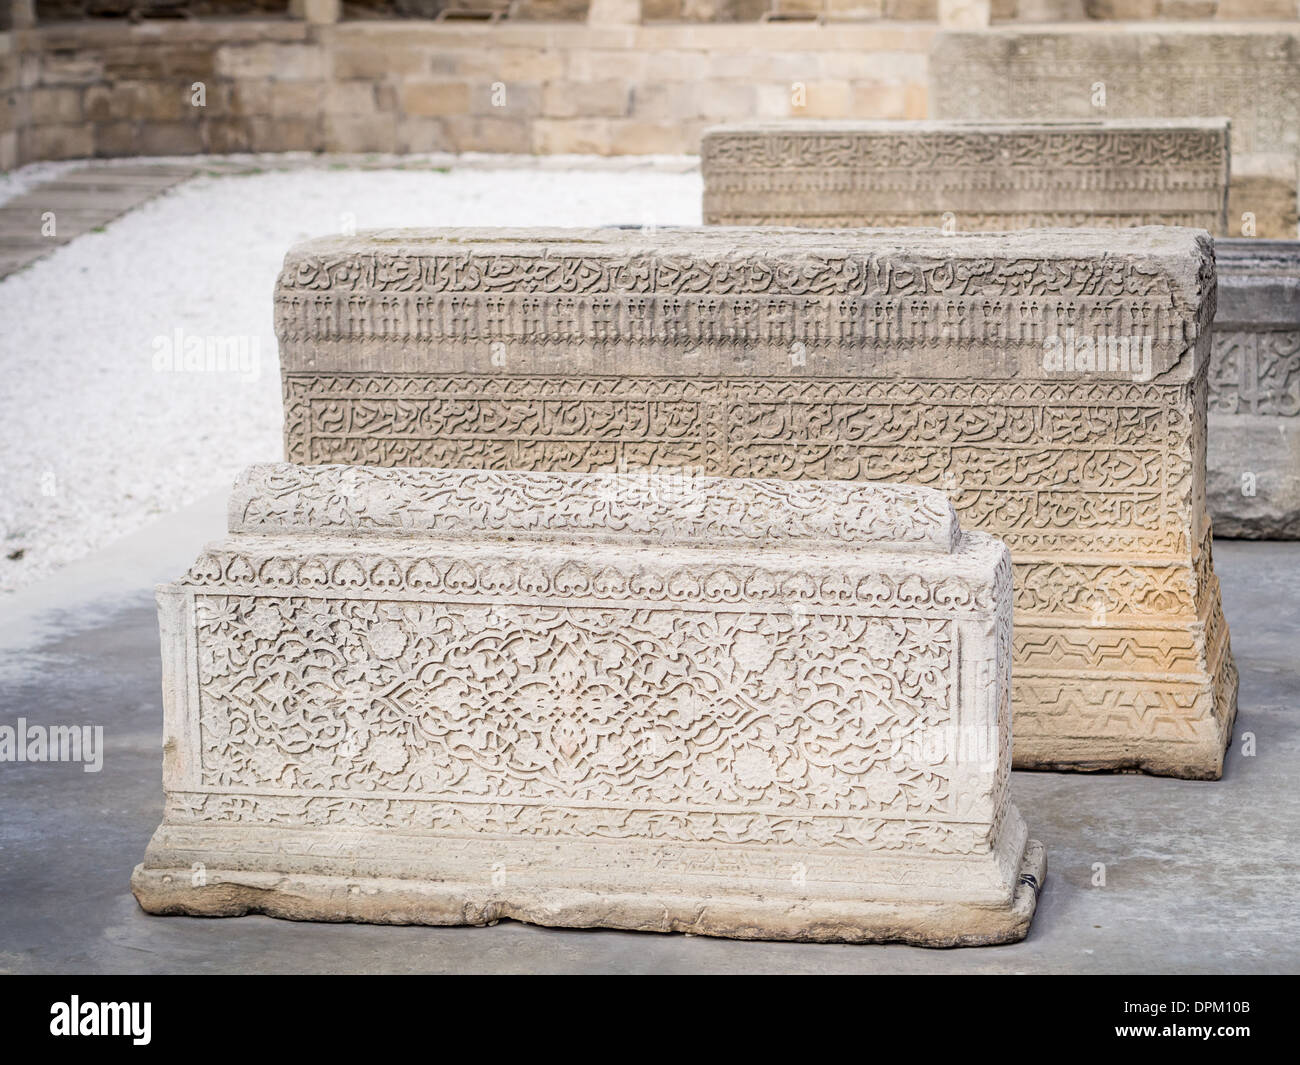 Courtyard with lapidarium in Icheri Sheher (Old Town) of Baku, Azerbaijan. - Stock Image